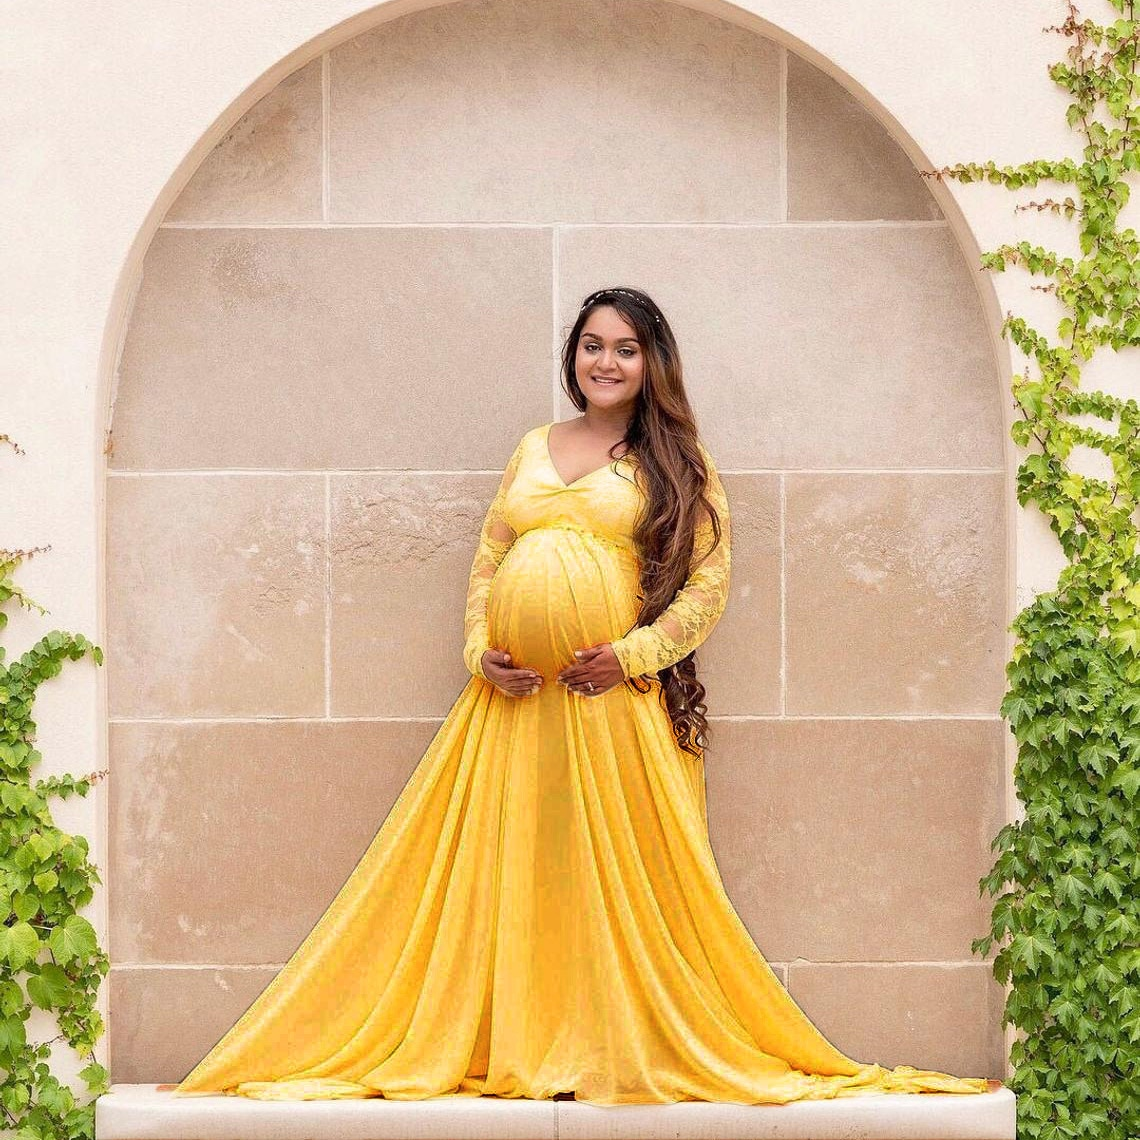 Maternity Maxi Dresses for Photo Shoot Long Sleeve Pregnant Women Baby Shower Sexy V Neck Long Pregnancy Dress Robe Grossesse enlarge